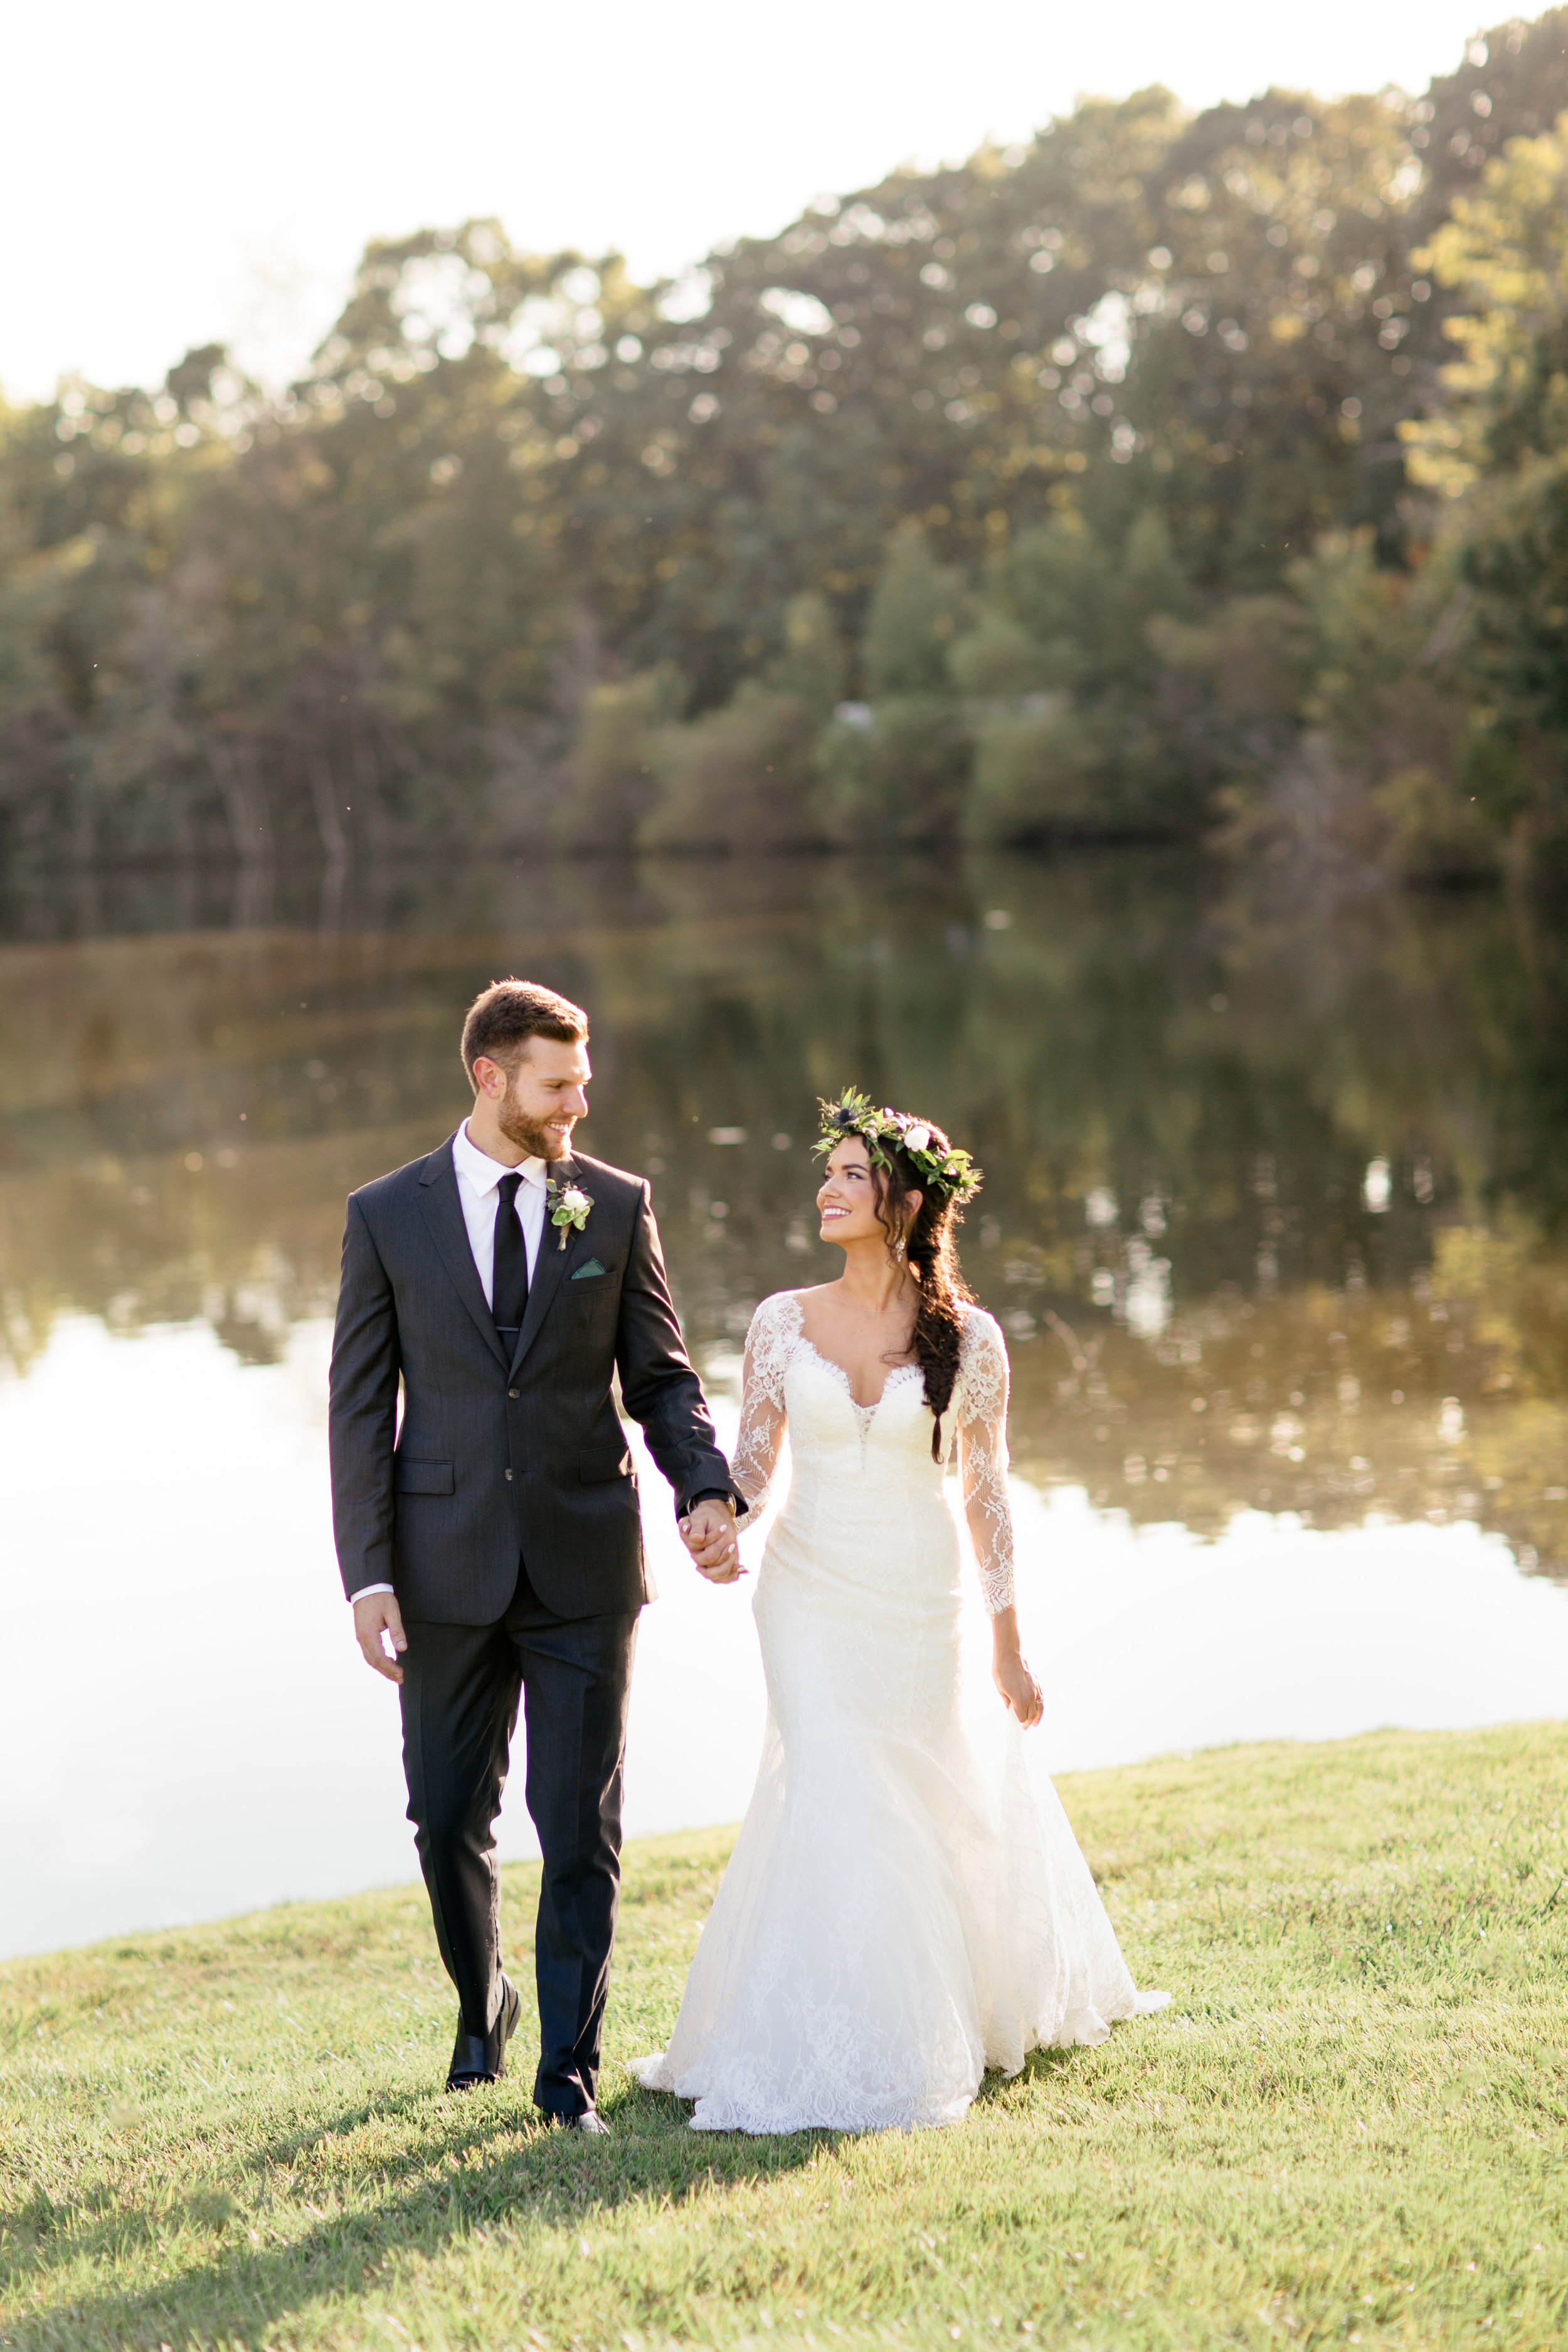 20170915_Redfern_Wedding_2427.jpg